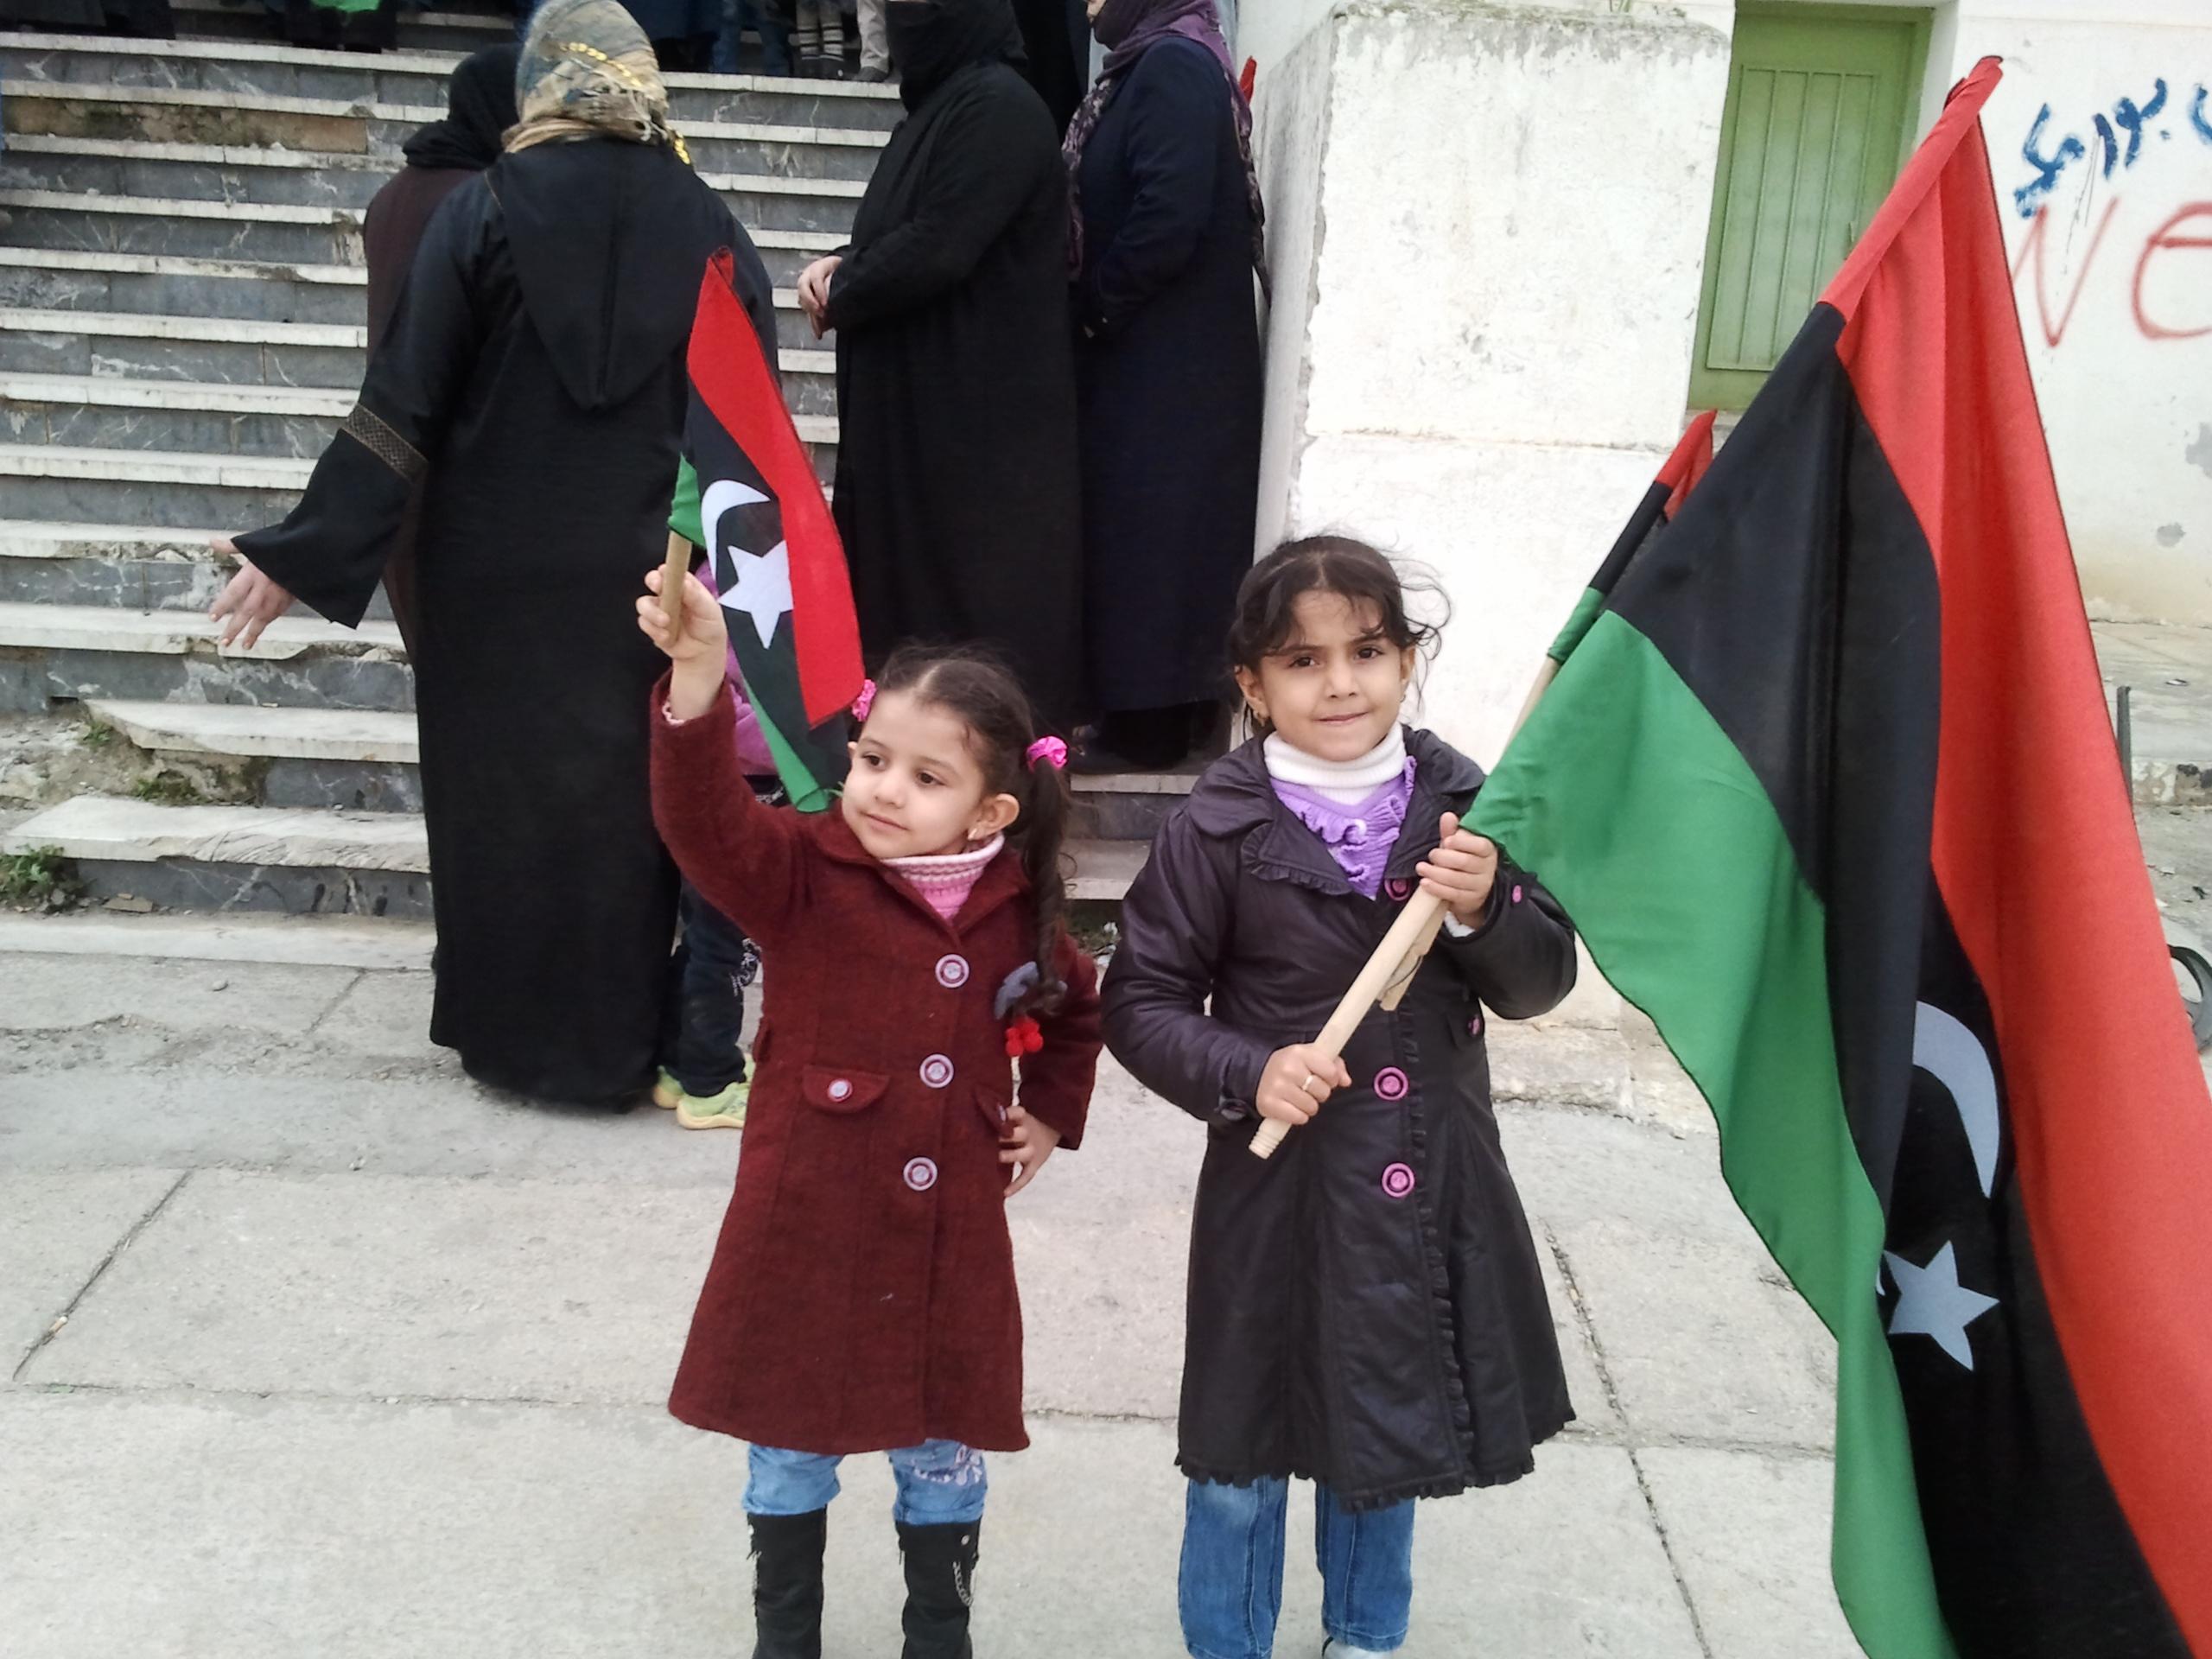 Libya >> File:Girls of Al Bayda (Libya, demonstration against Gaddafi).jpg - Wikimedia Commons